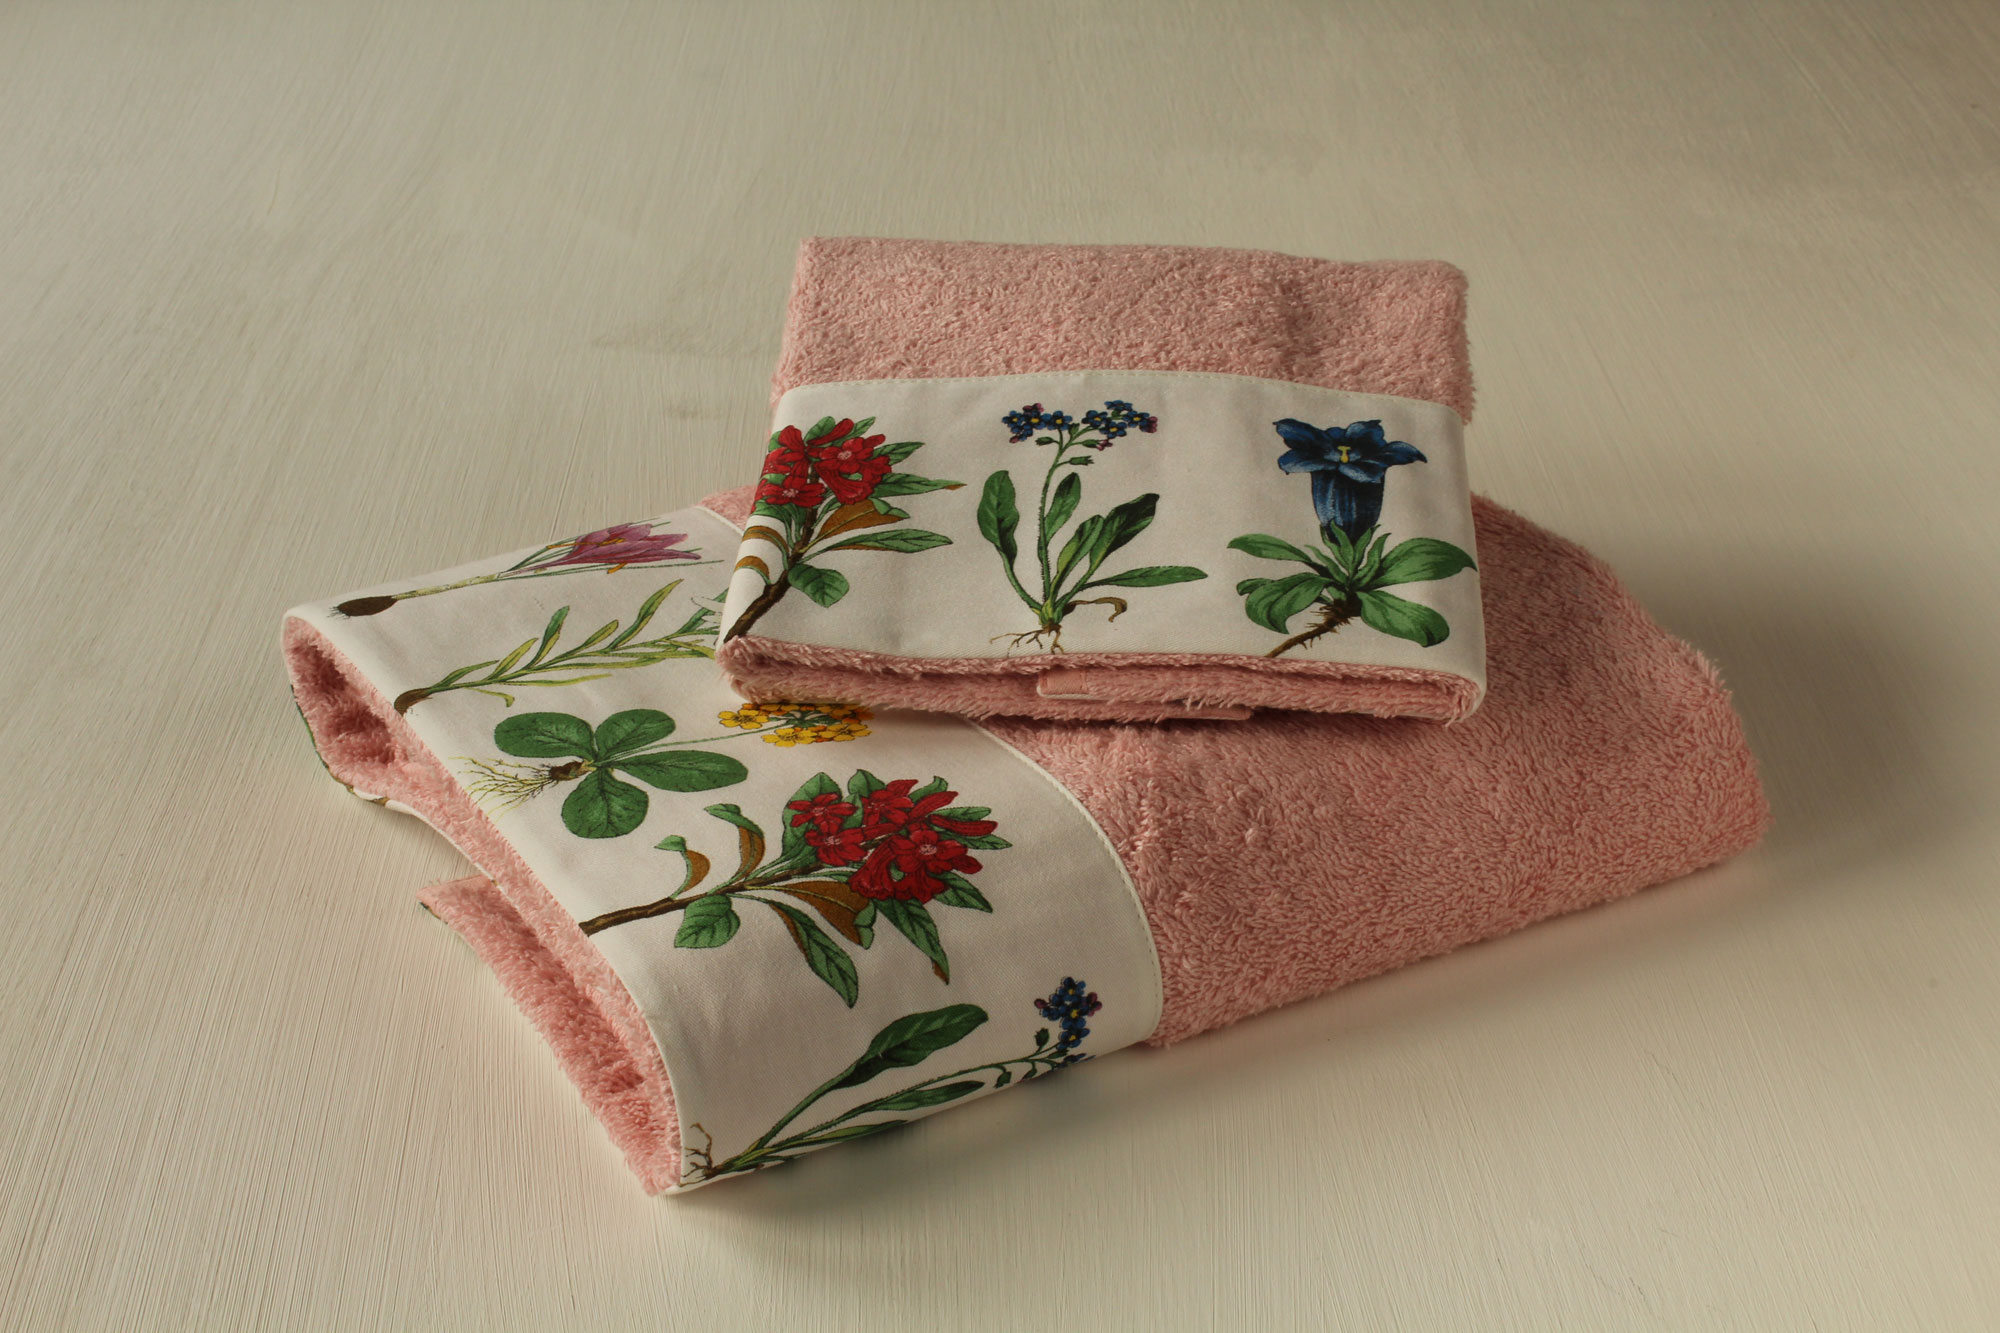 Coppia asciugamani Fiori Montagna - Giardino di Rose: Biancheria per ...